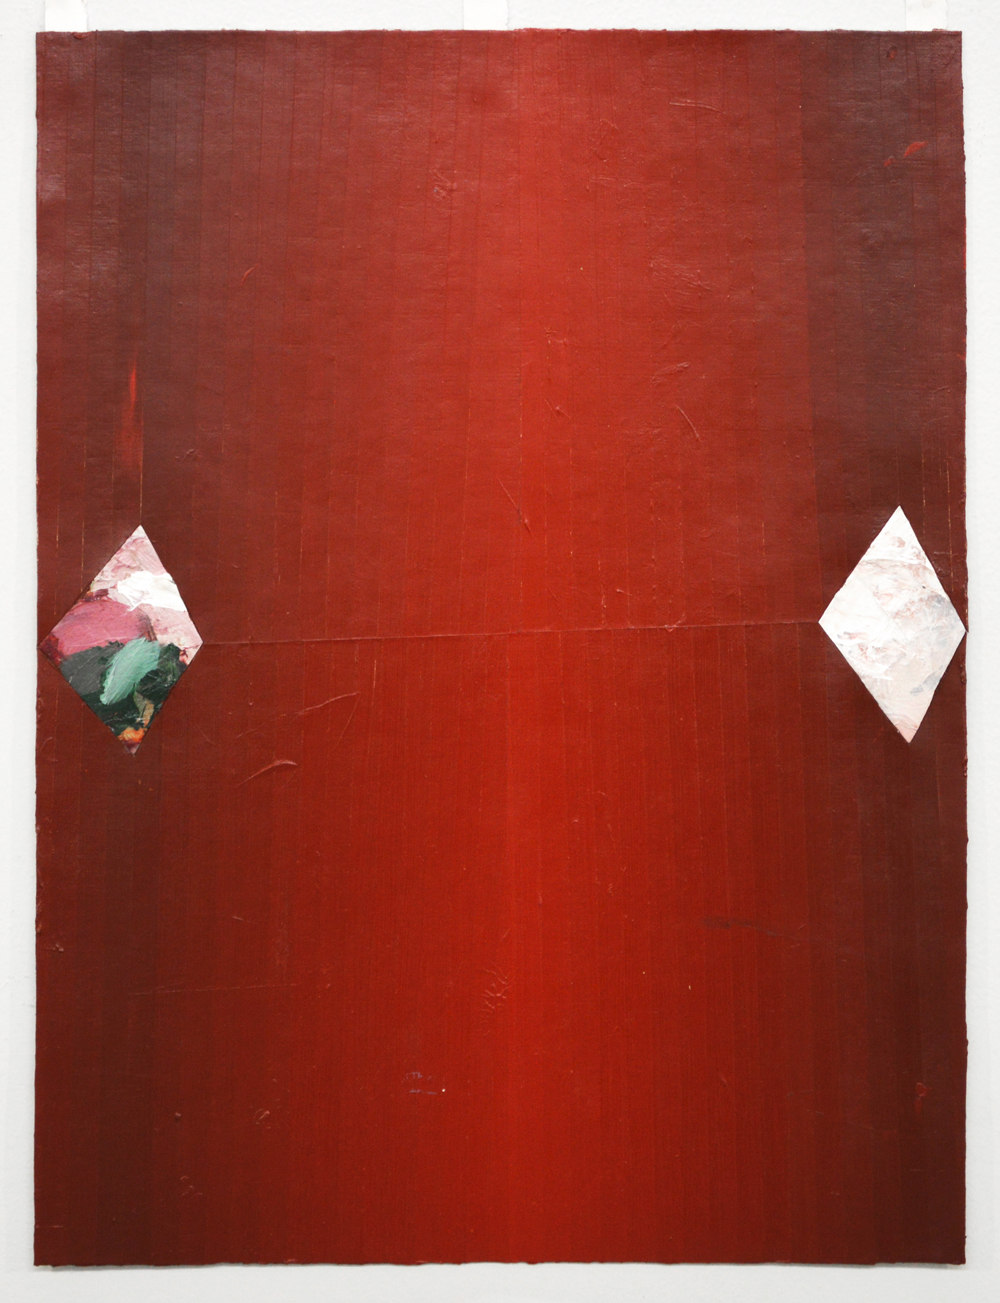 Untitled  Acrylic, styrofoam on canvas  24 x 18 in  2014